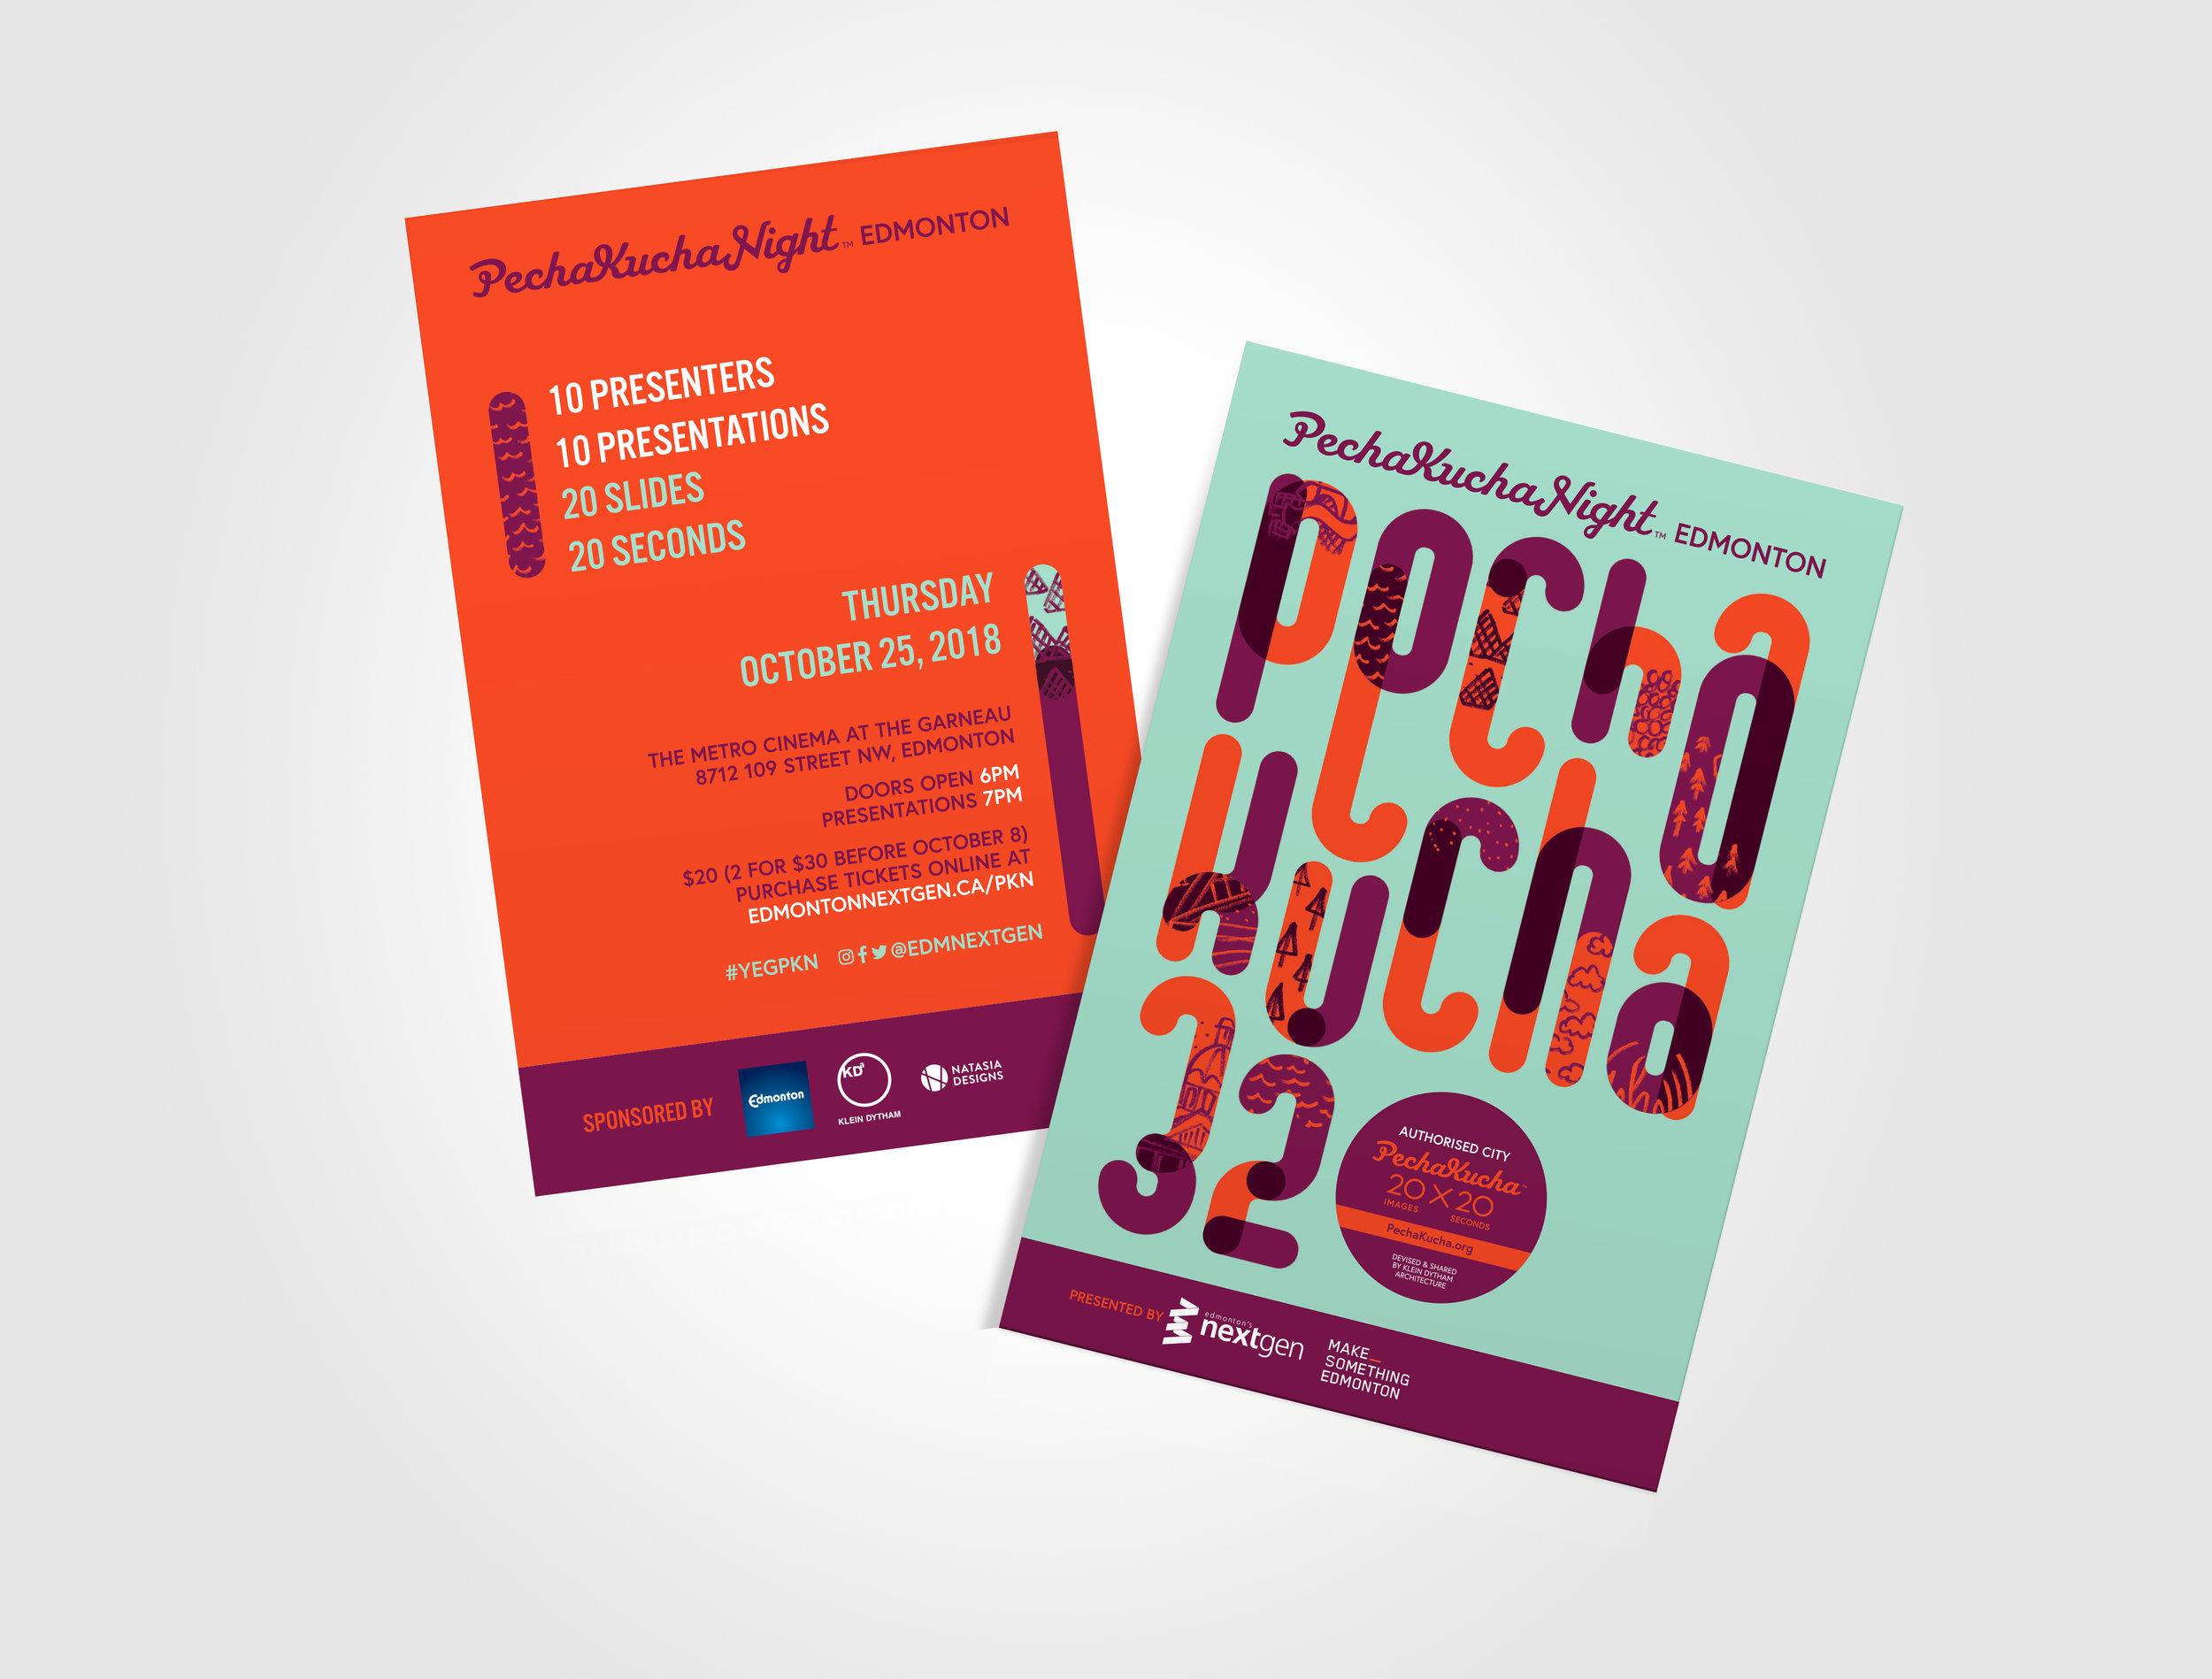 Pecha Kucha Night Edmonton Event Promotion